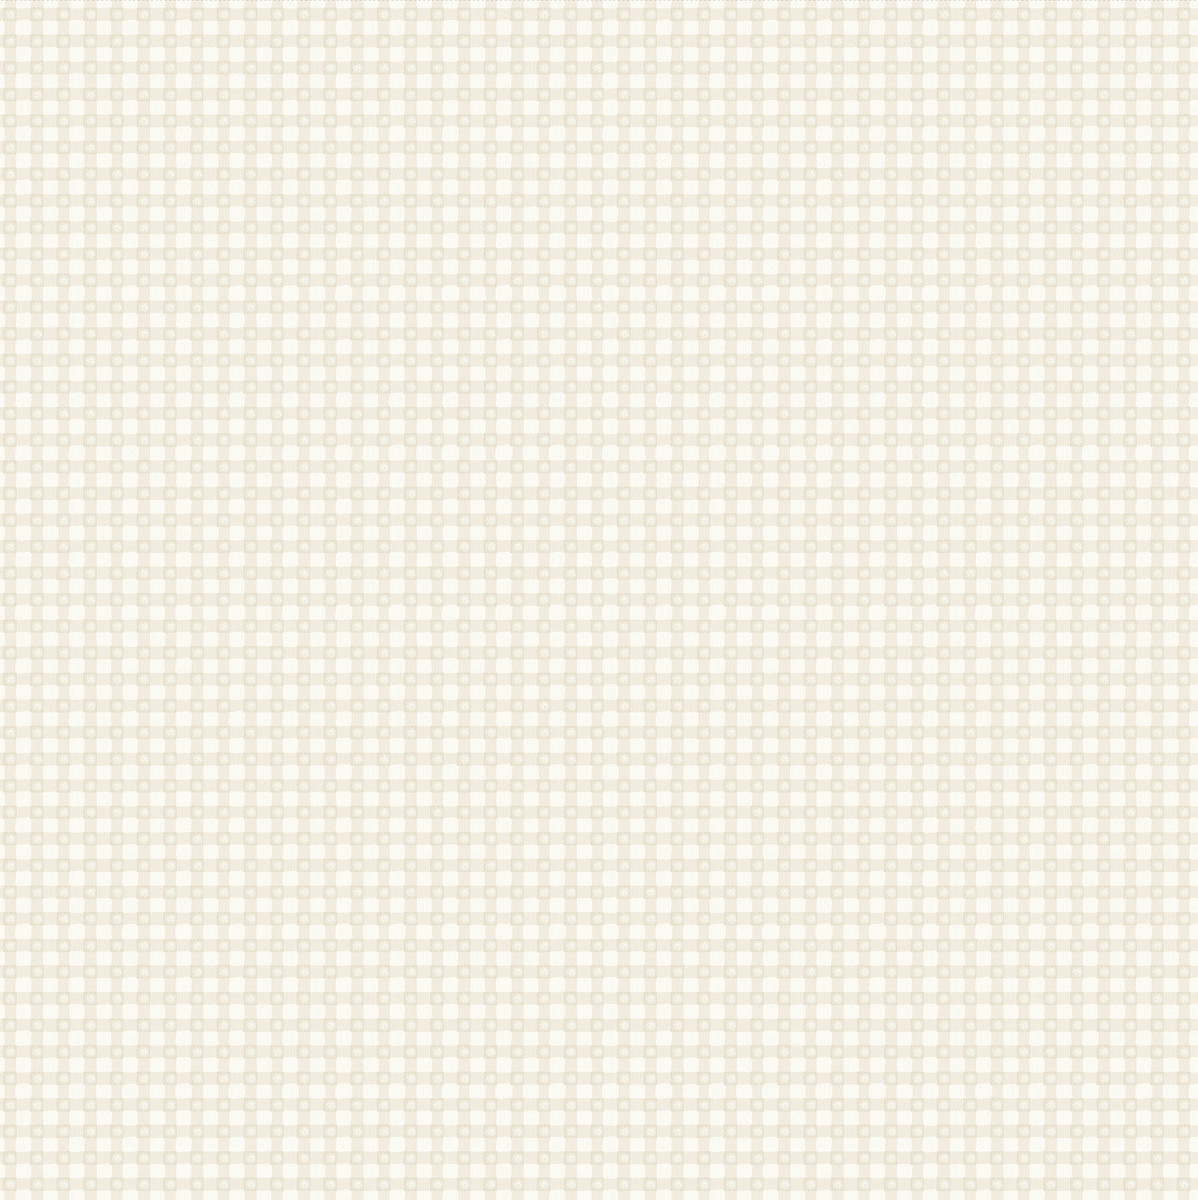 papel de parede xadrez bege 1743 no elo7 wp decor 594ef4